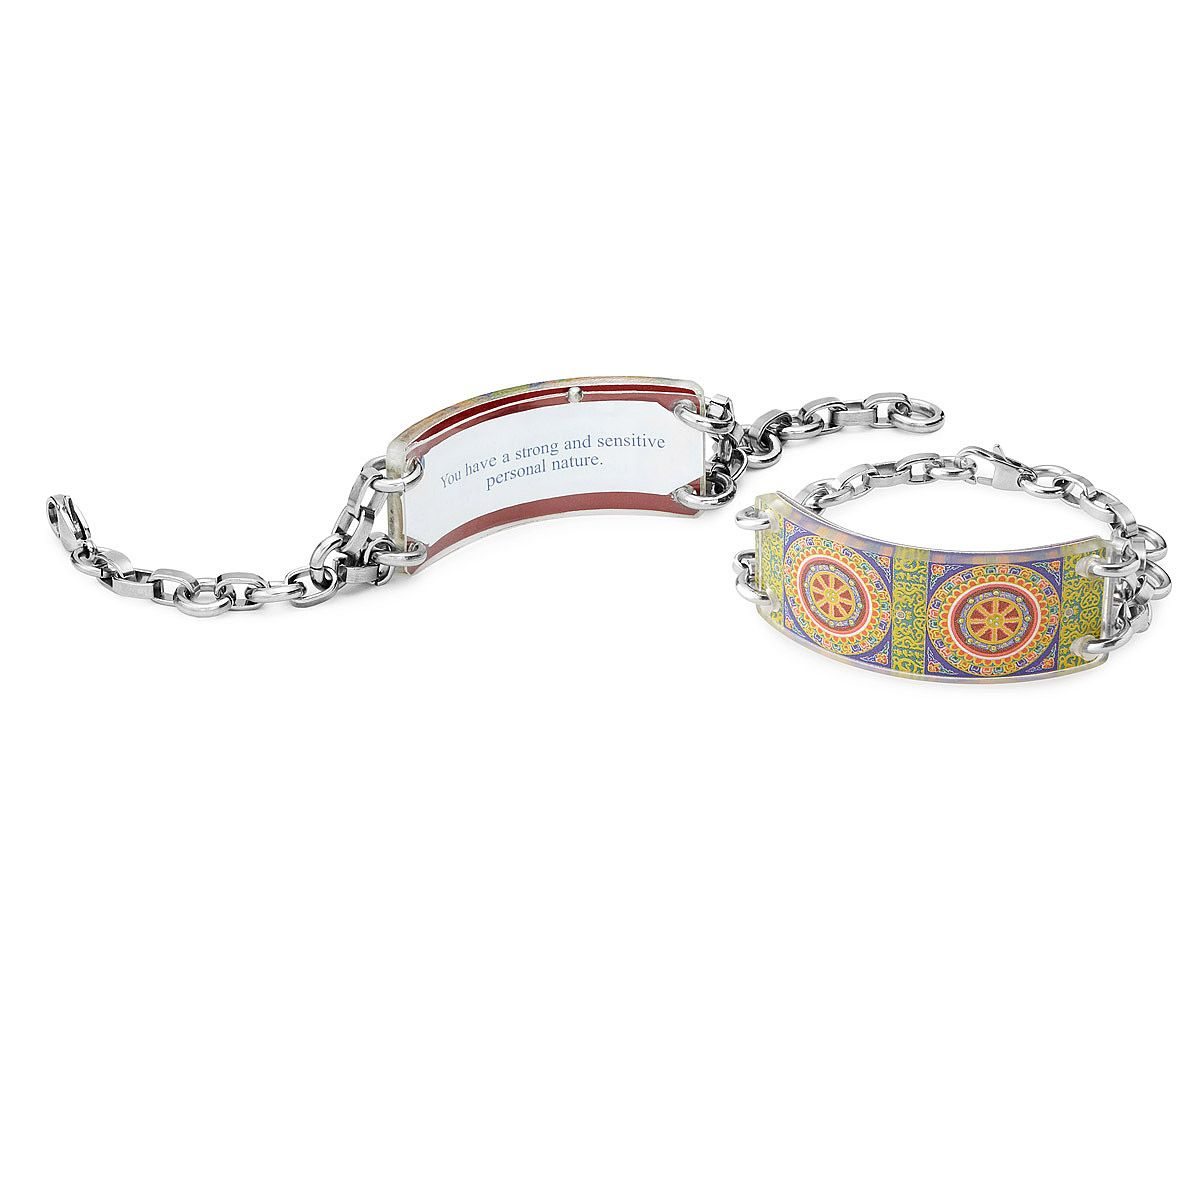 Fortune Keeper Bracelet | fortune cookie bracelet, paper fortune cookies | UncommonGoods